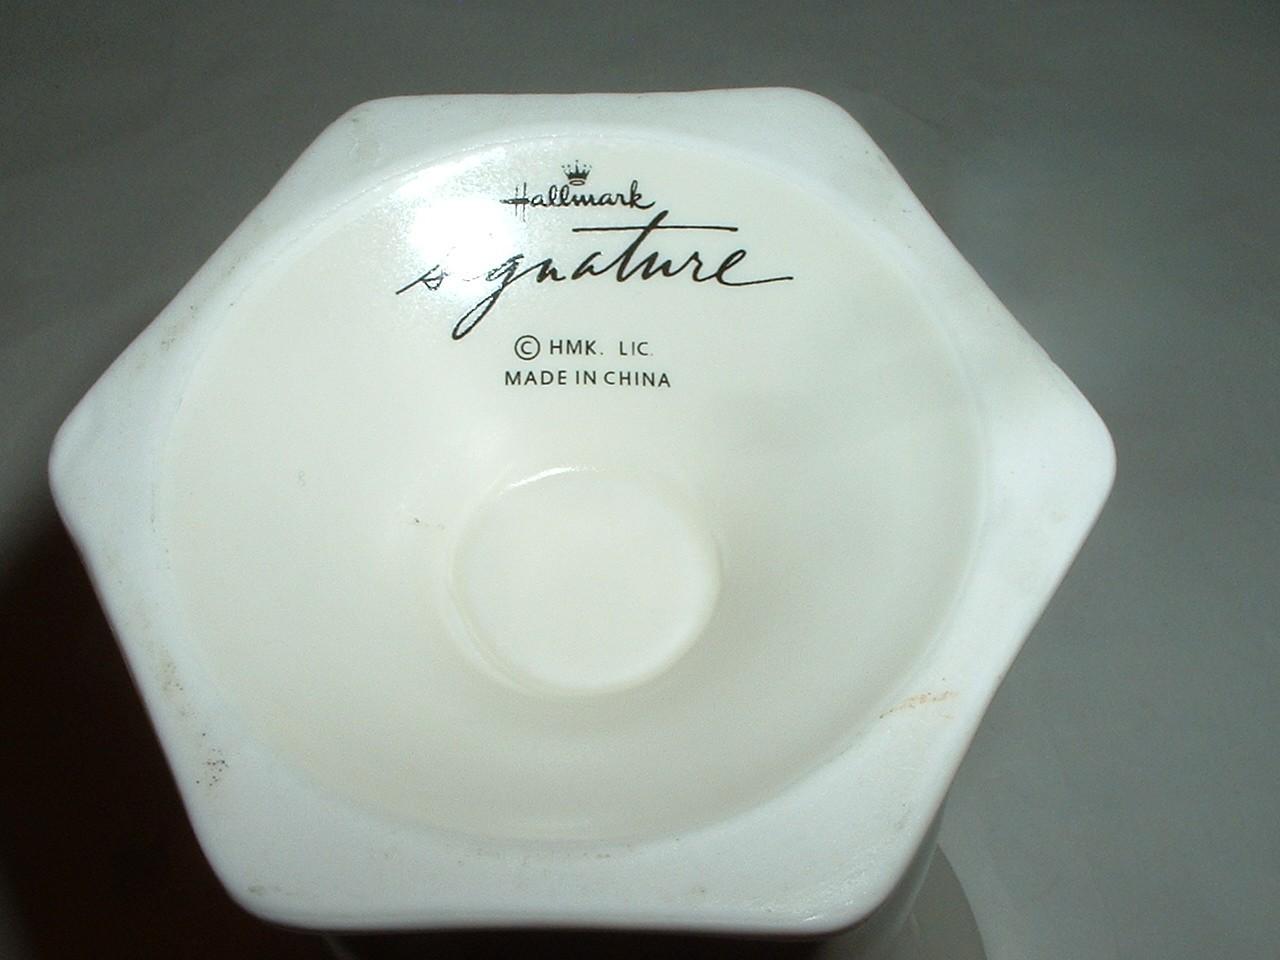 Vintage Hallmark Signature Creamy White Porcelain  Vase